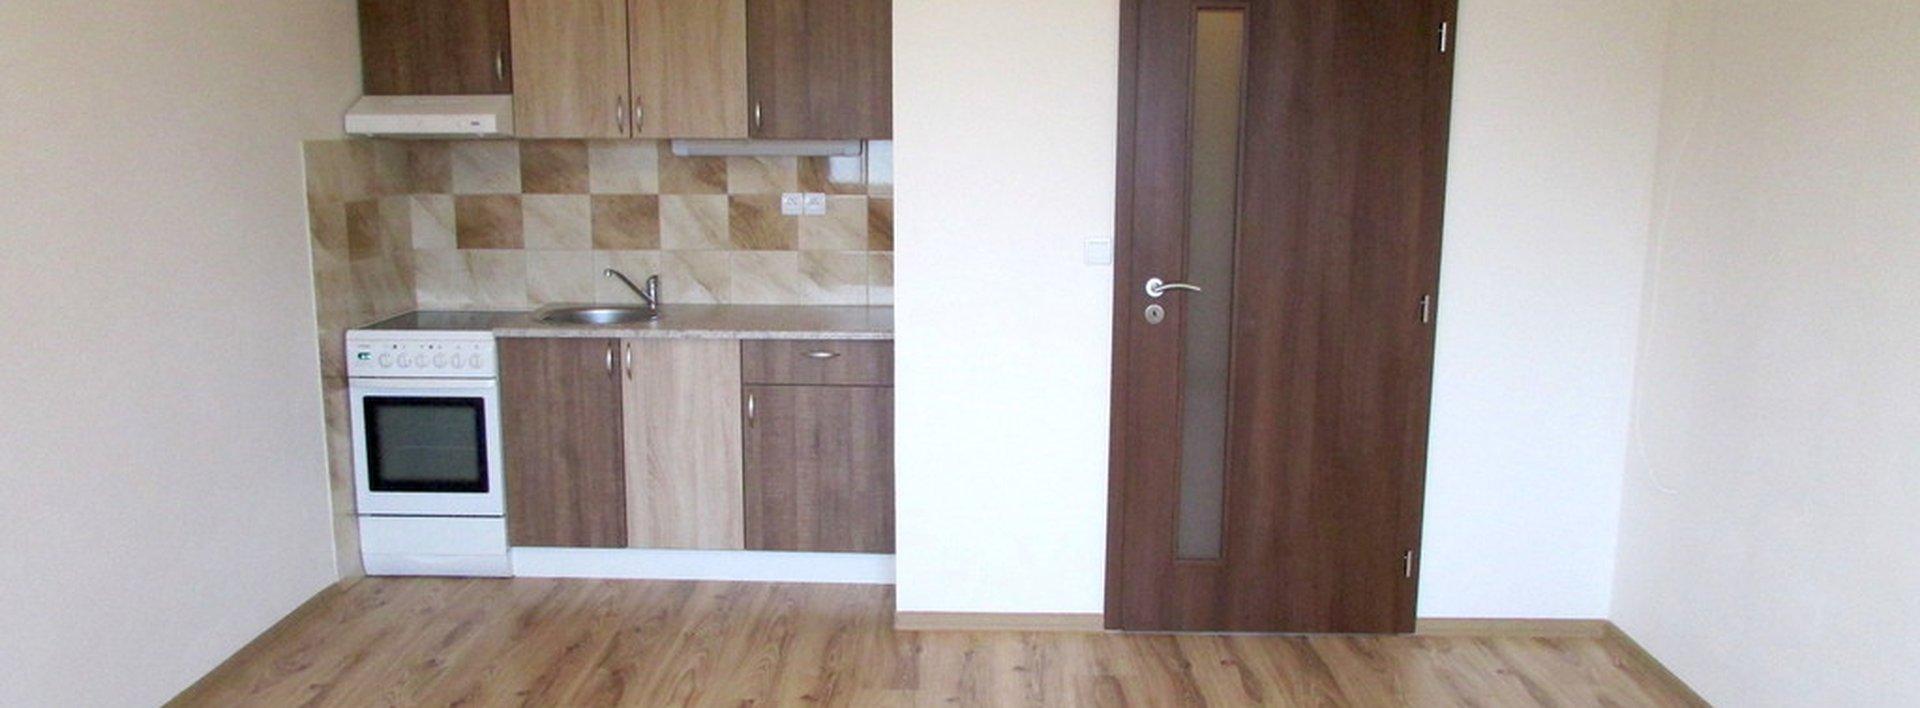 Pronájem bytu 2+kk, 44m² - ul. Vackova, Liberec - Doubí, Ev.č.: N47429